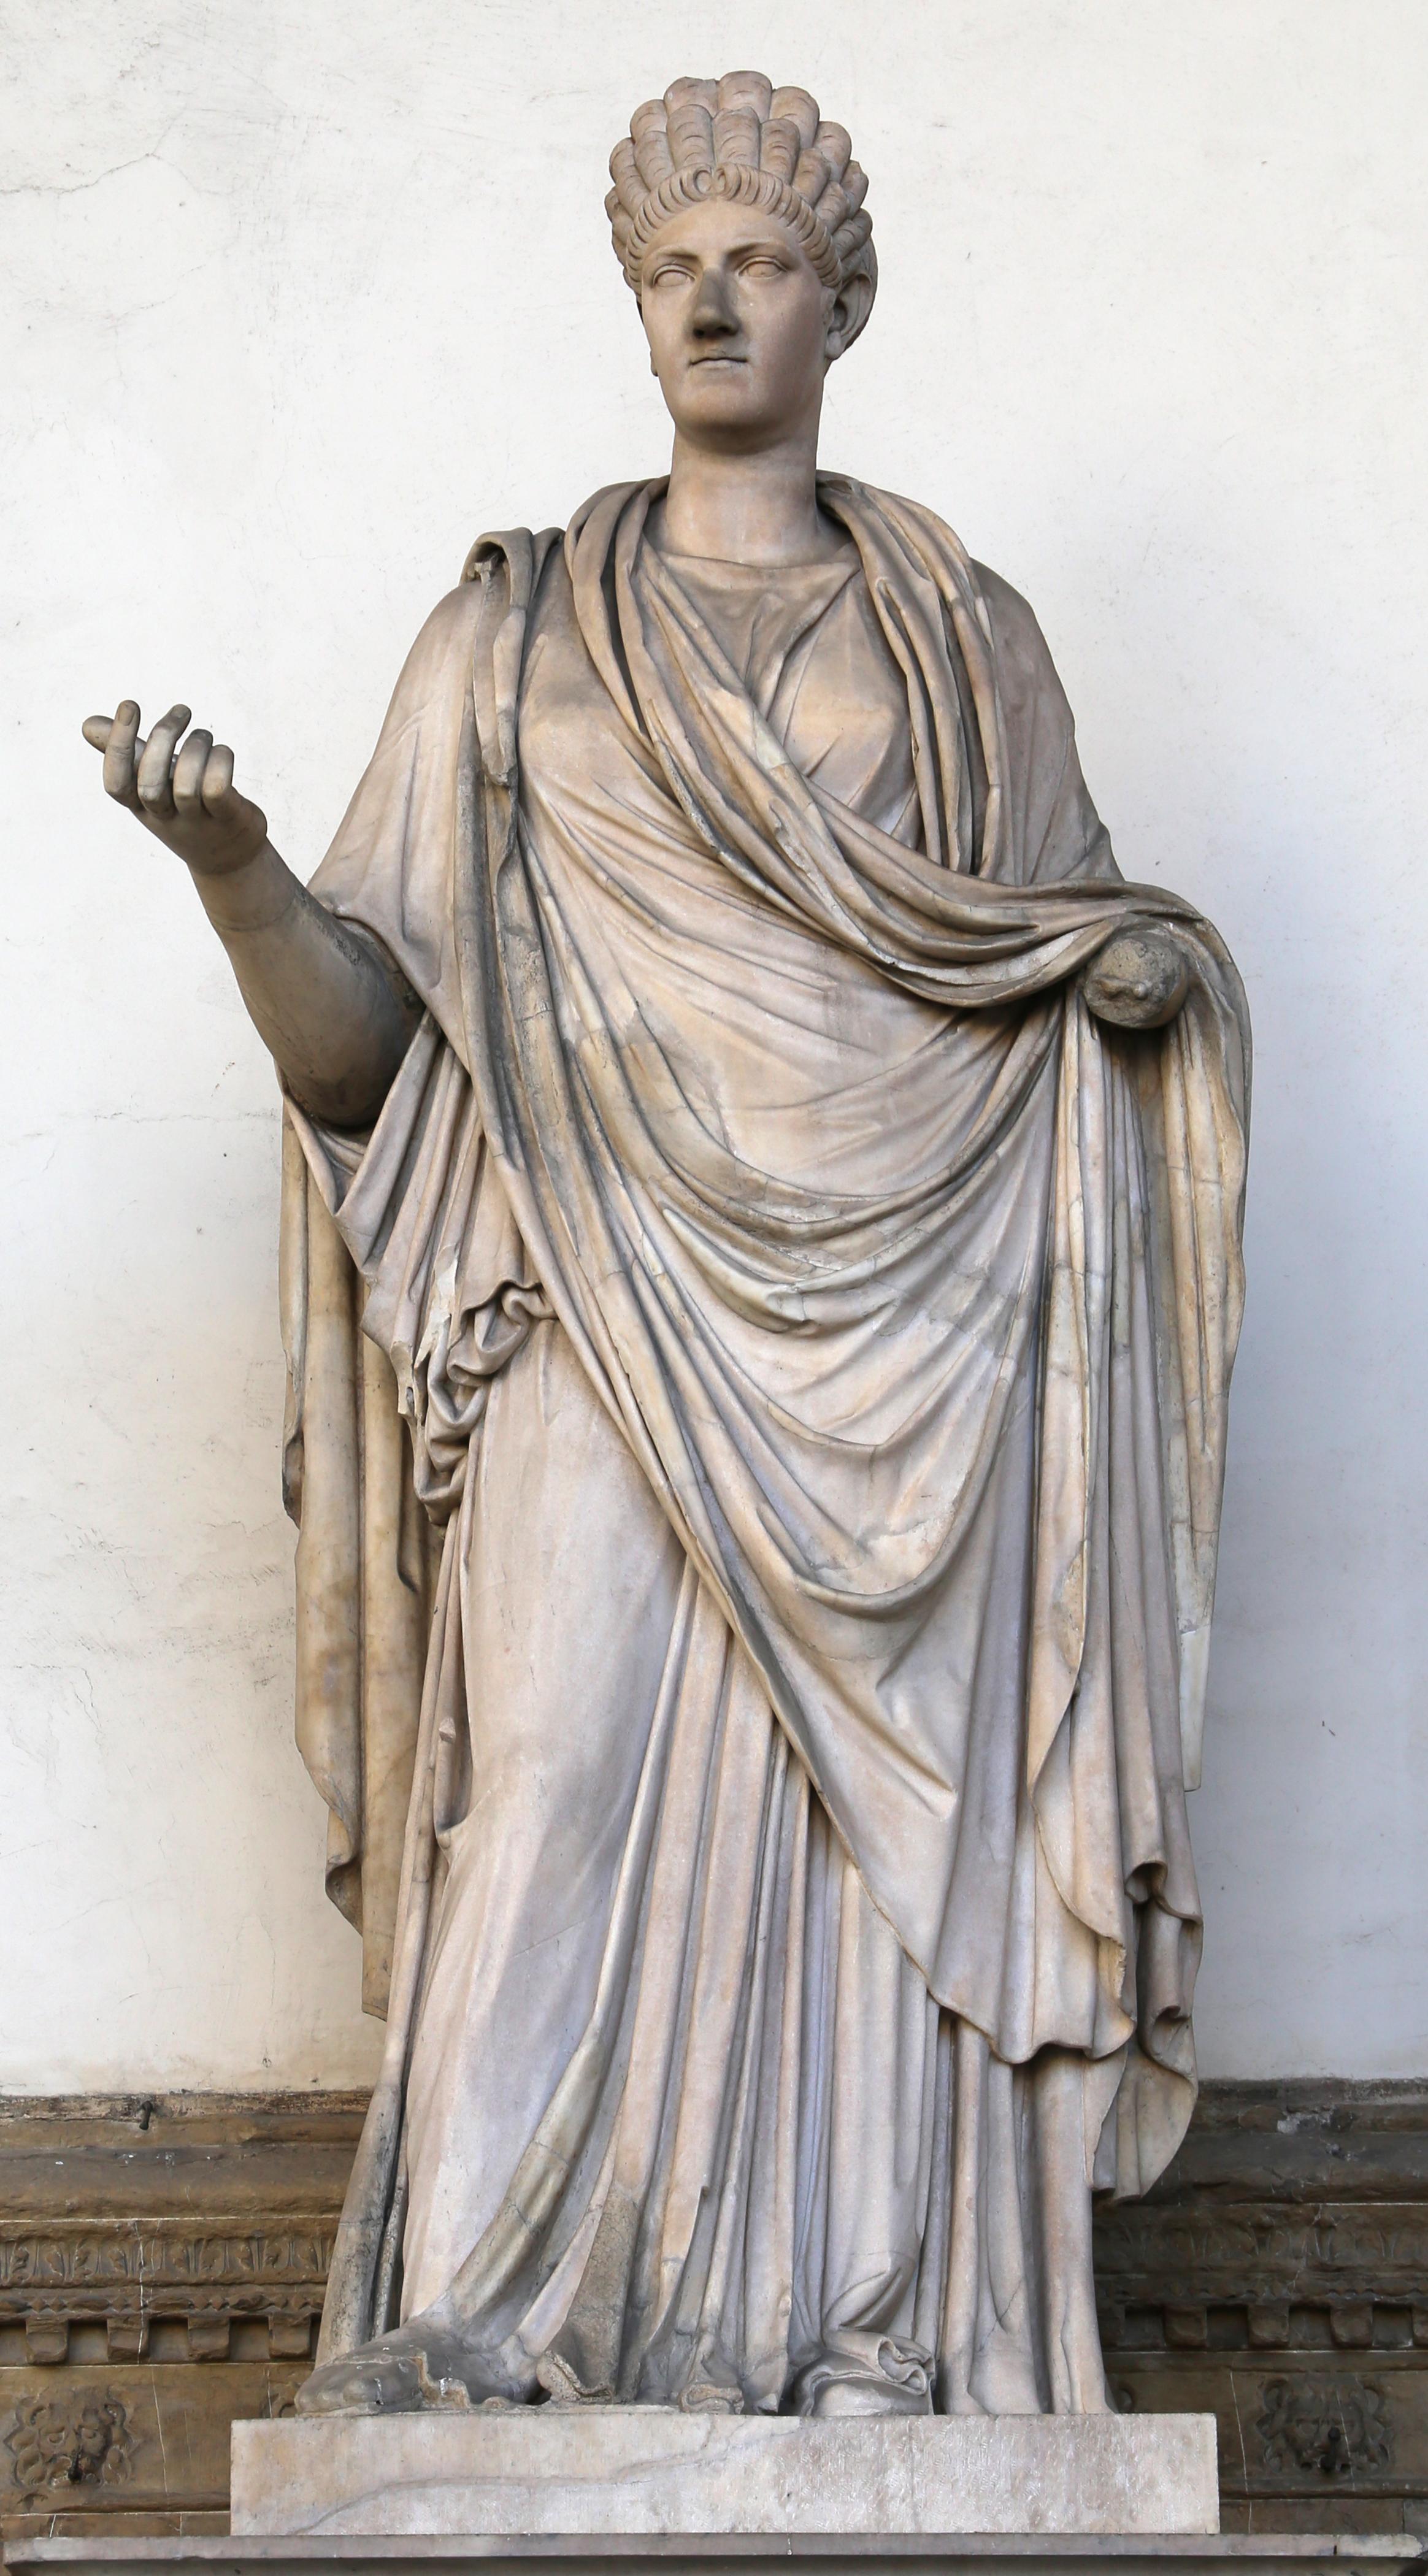 Arte romana, donna togata detta una 'sabina', 110 dc ca., con restauri moderni 03.jpg